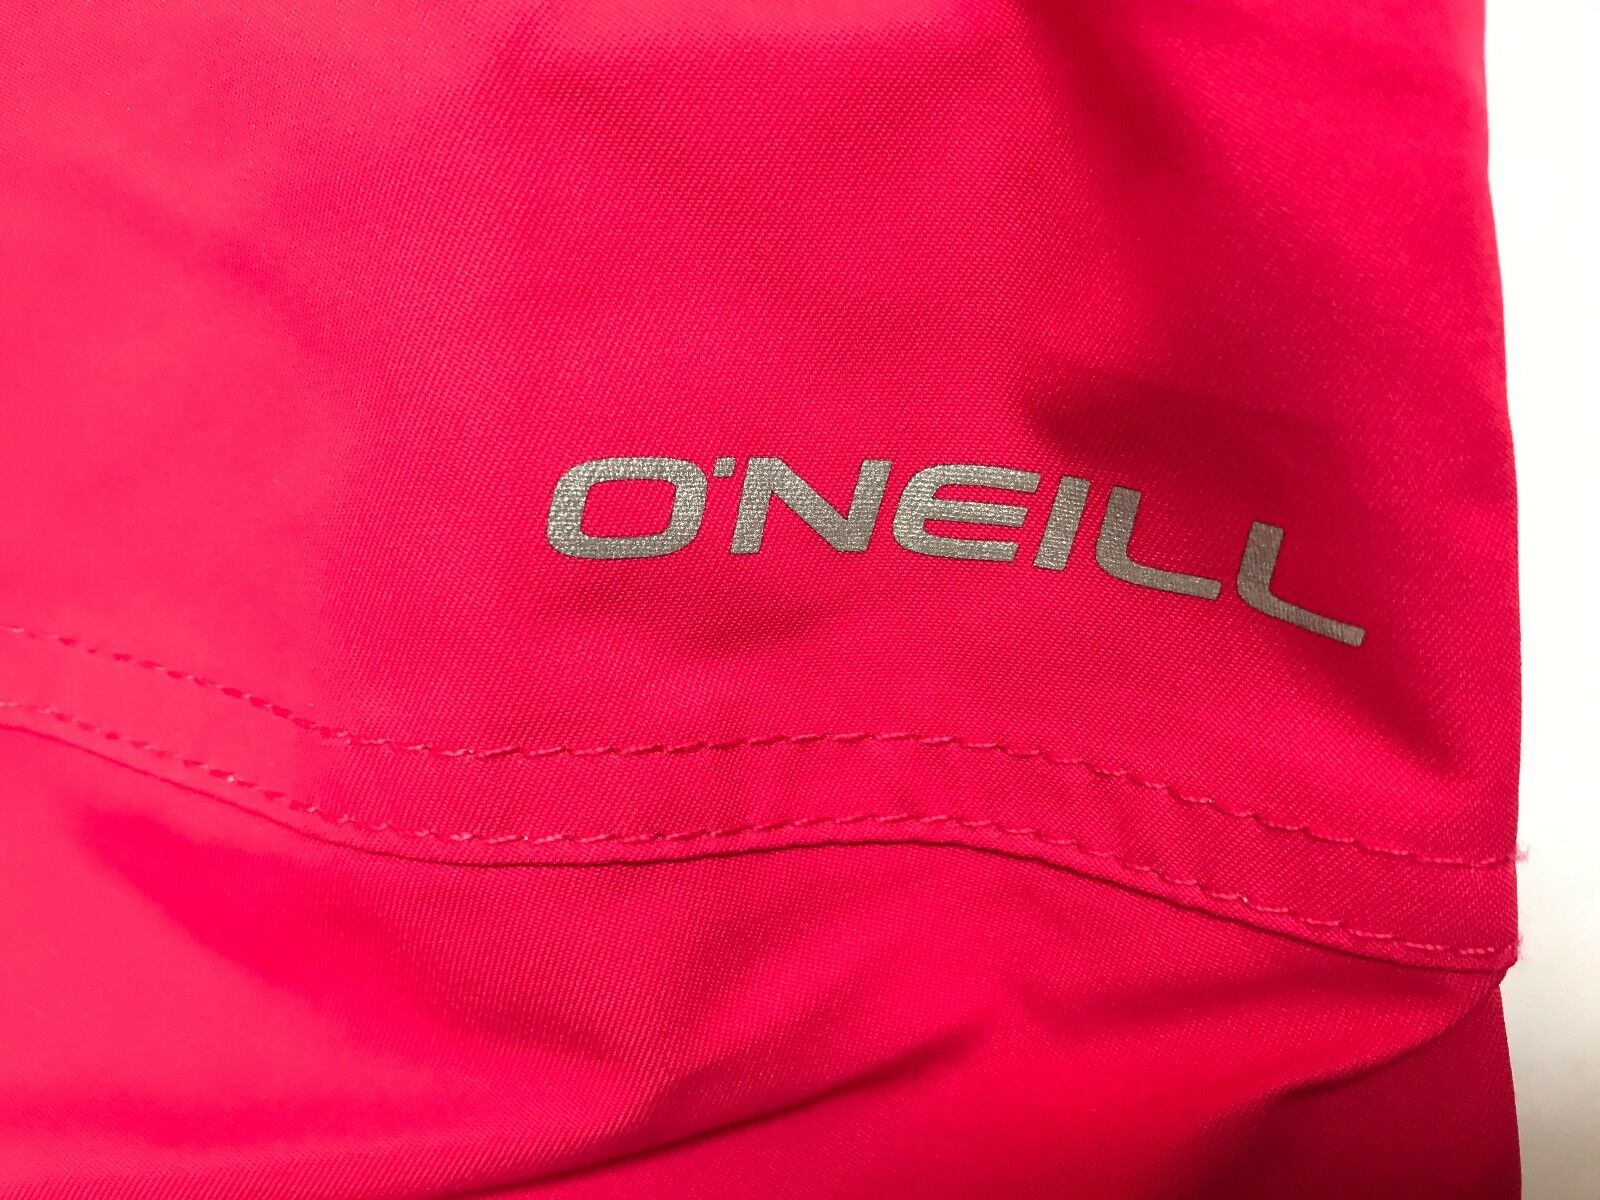 O'Neill Girls Charm Snow Winter Snowboard Ski Pant 14 Größe 14 Pant Virtual Rosa 46f396